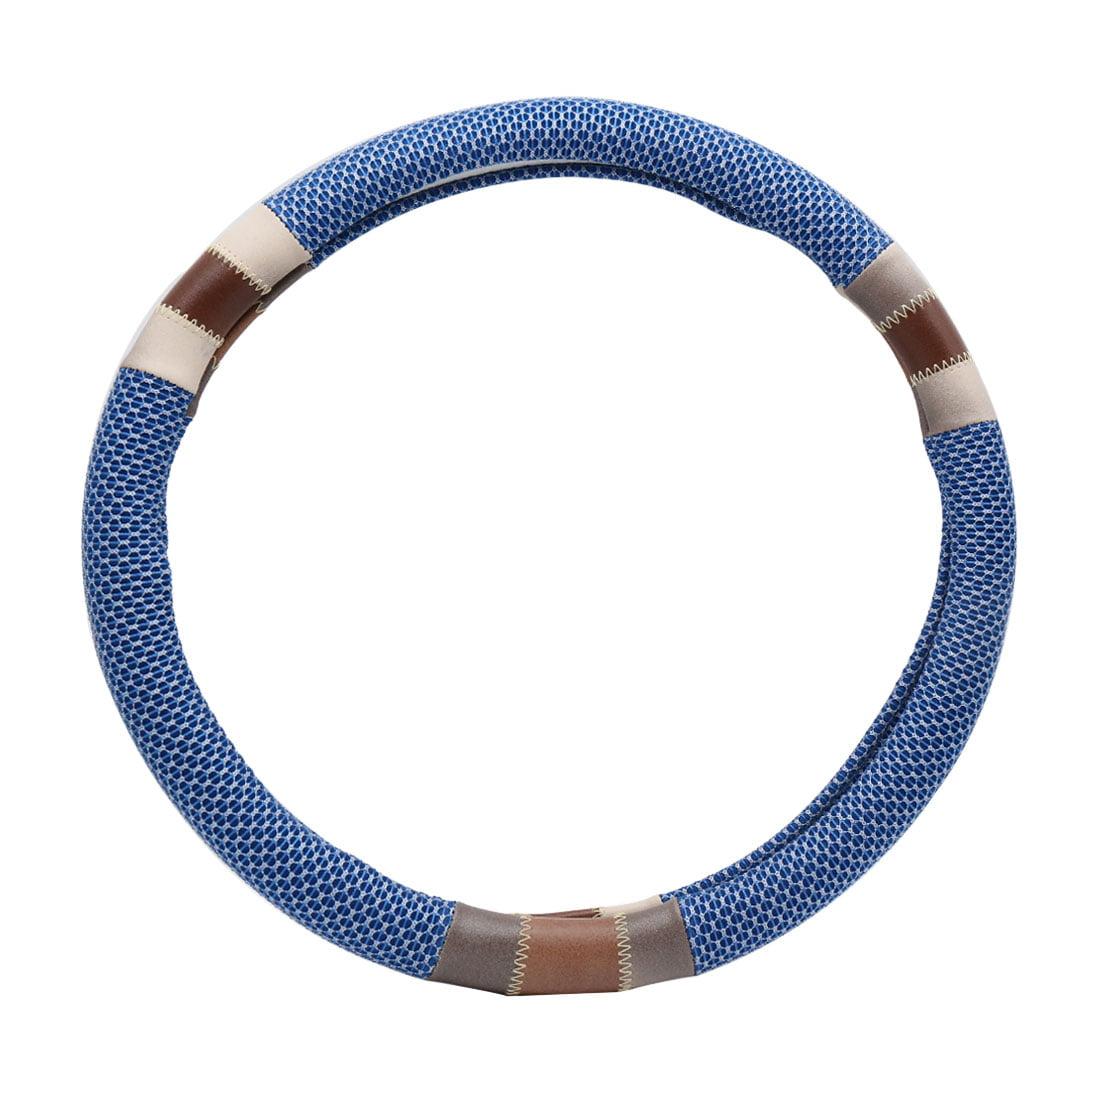 Blue Anti Slip Steering Wheel Cover Protector for Vehicle Car 37-38CM - image 2 de 2